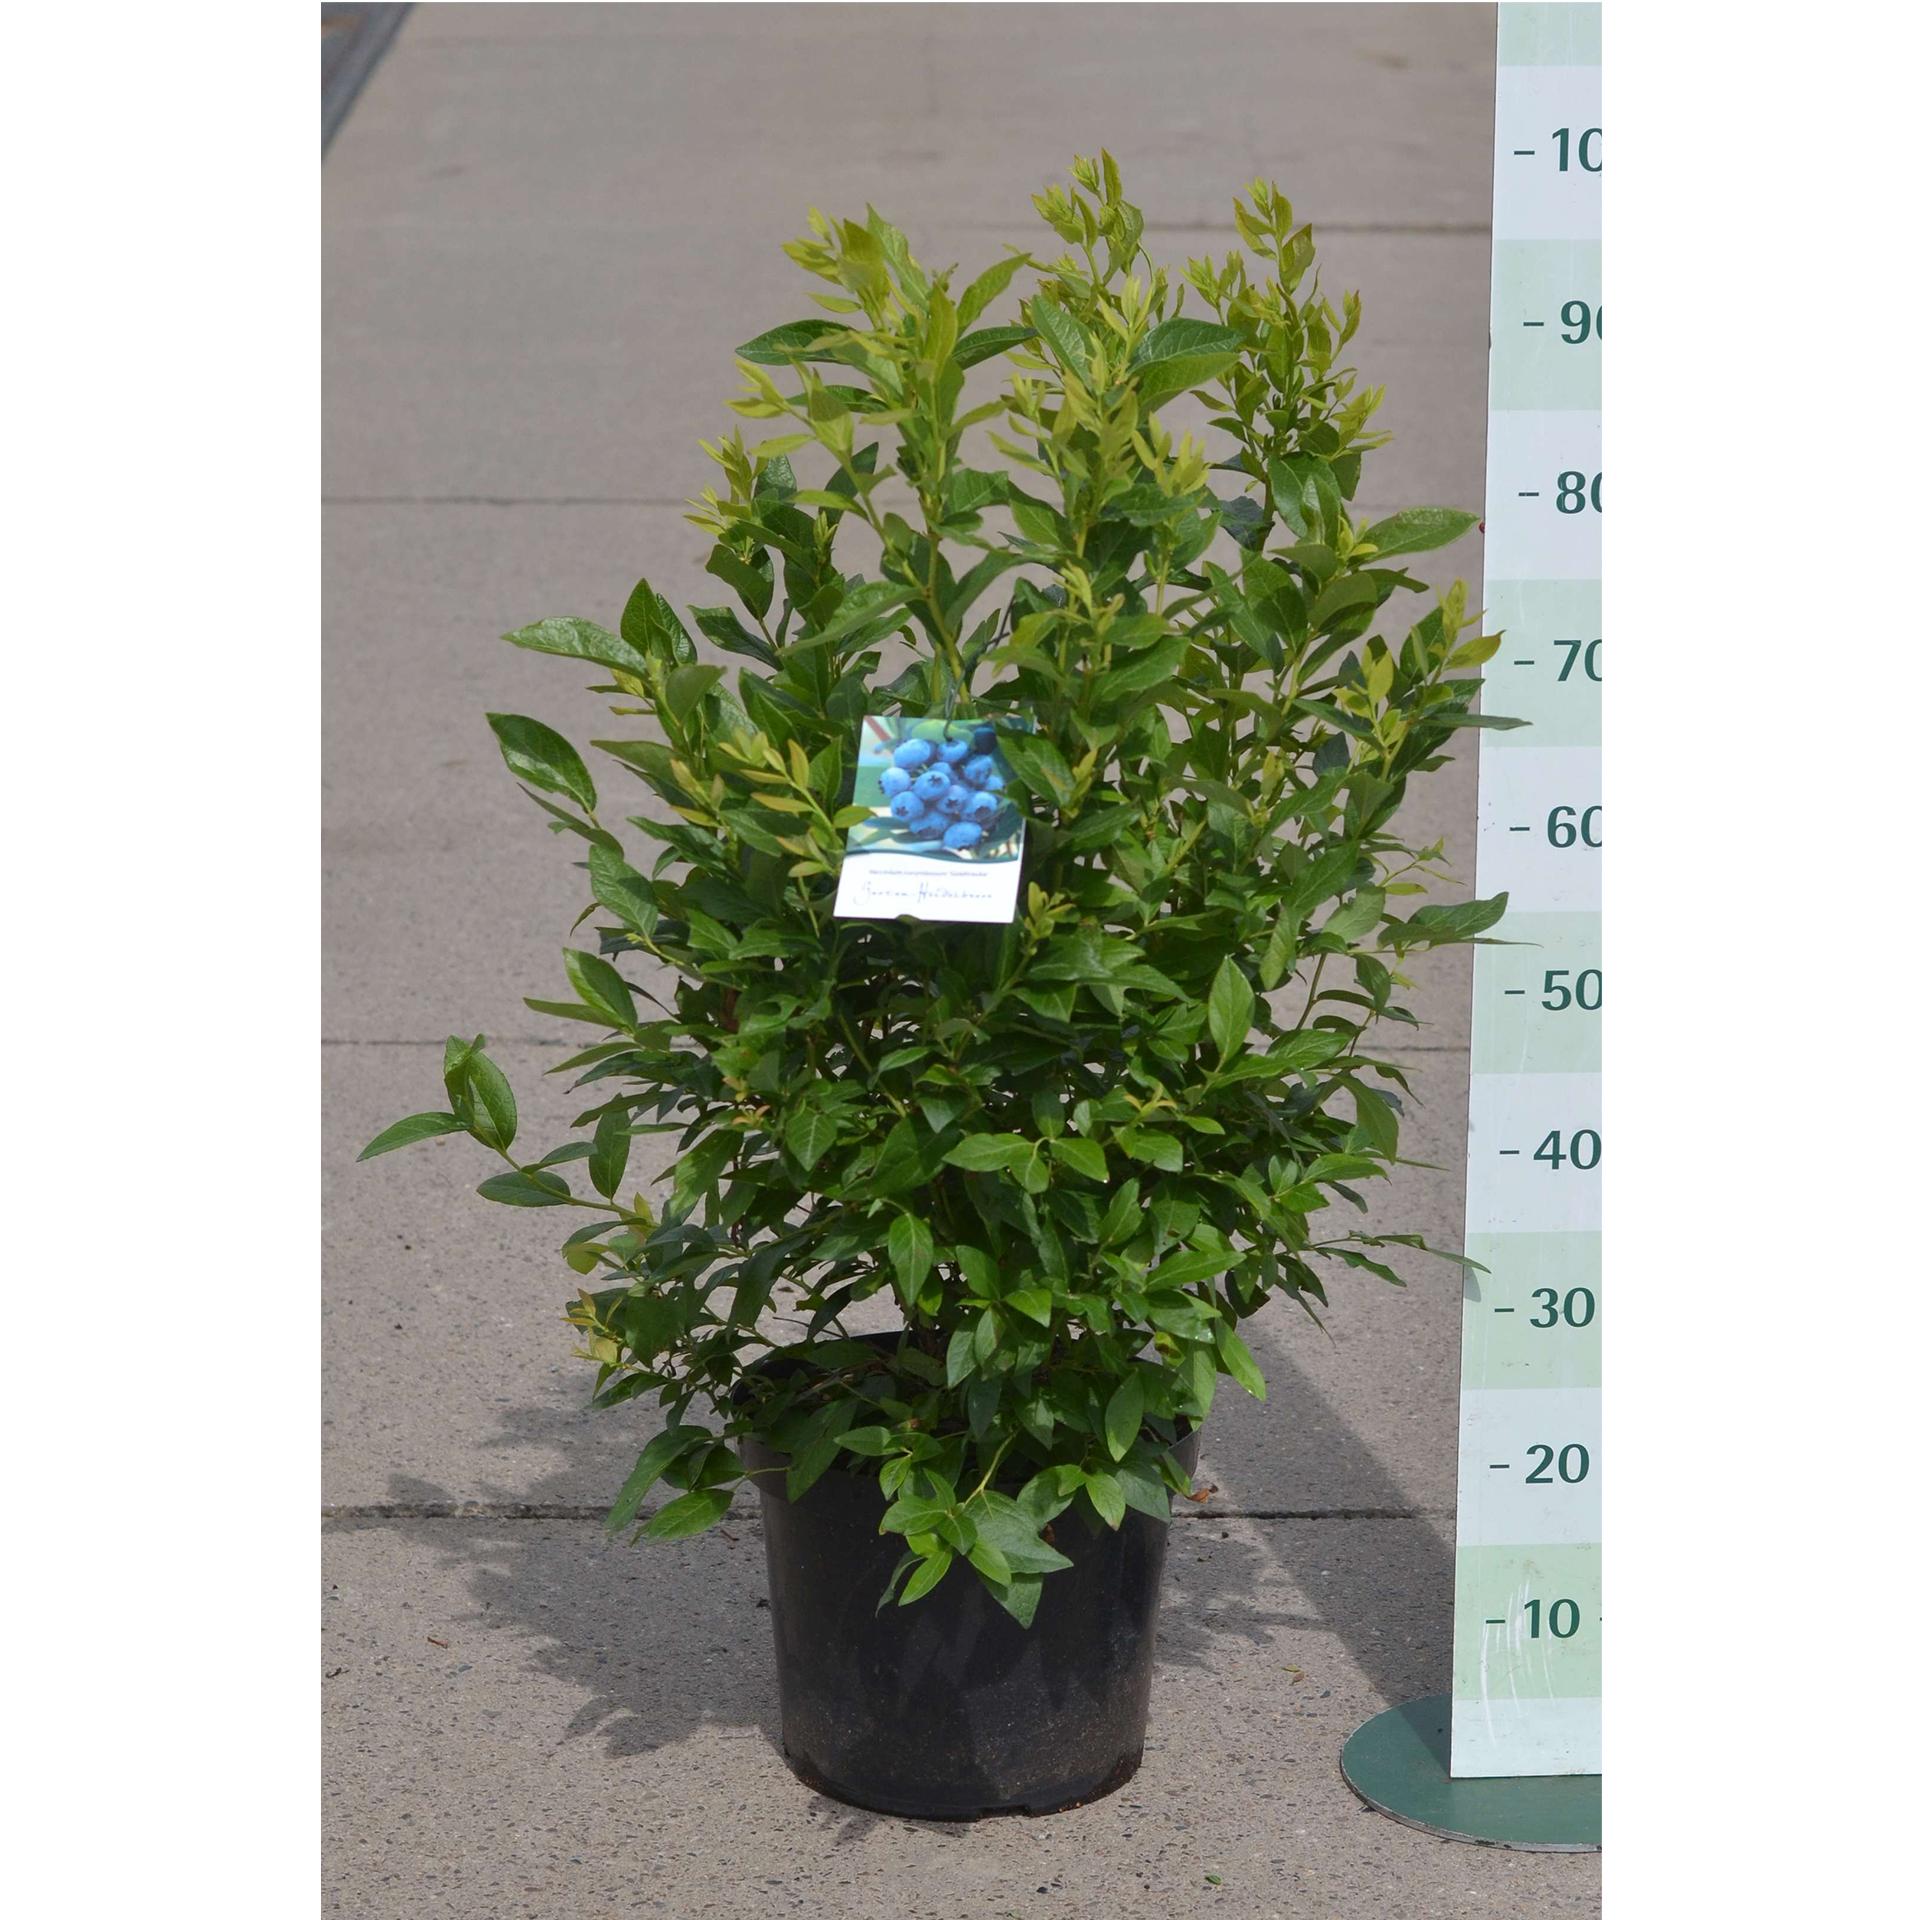 Heidelbeere - Vaccinium corymbosum 'Goldtraube', 80-100cm